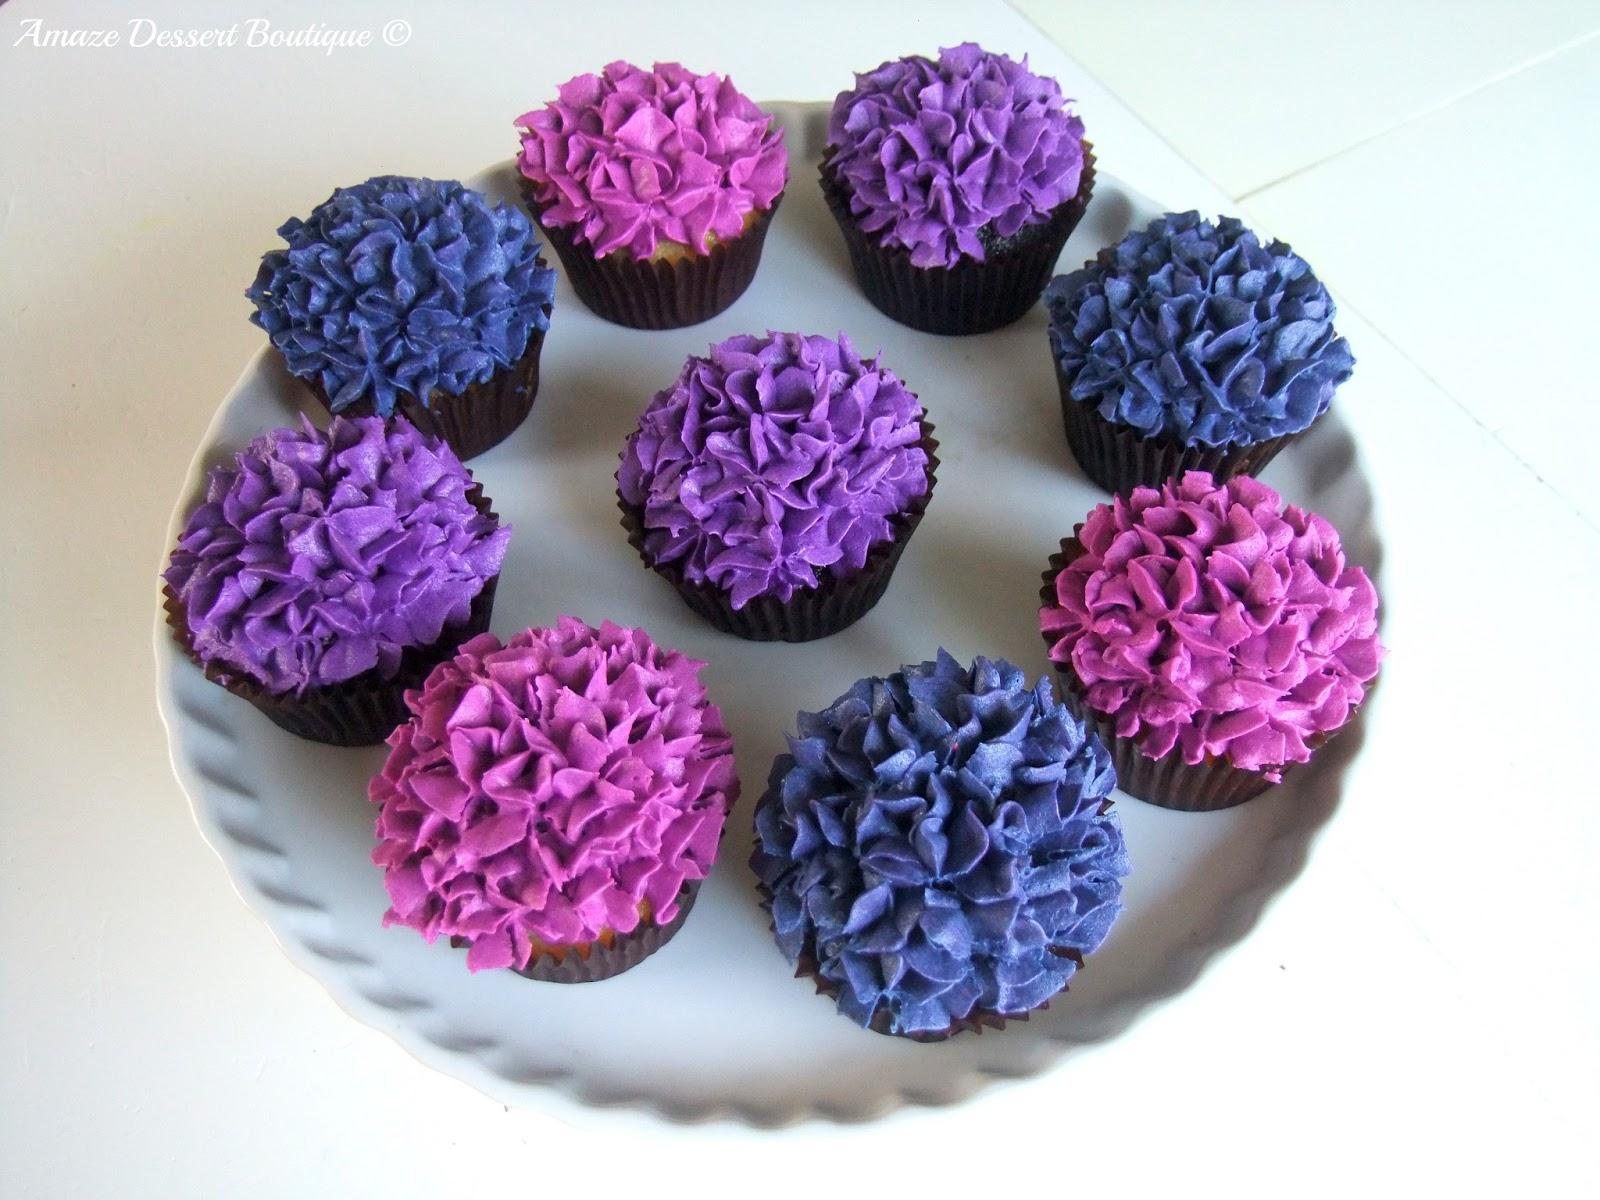 Amaze Dessert Boutique Hydrangea Cupcakes